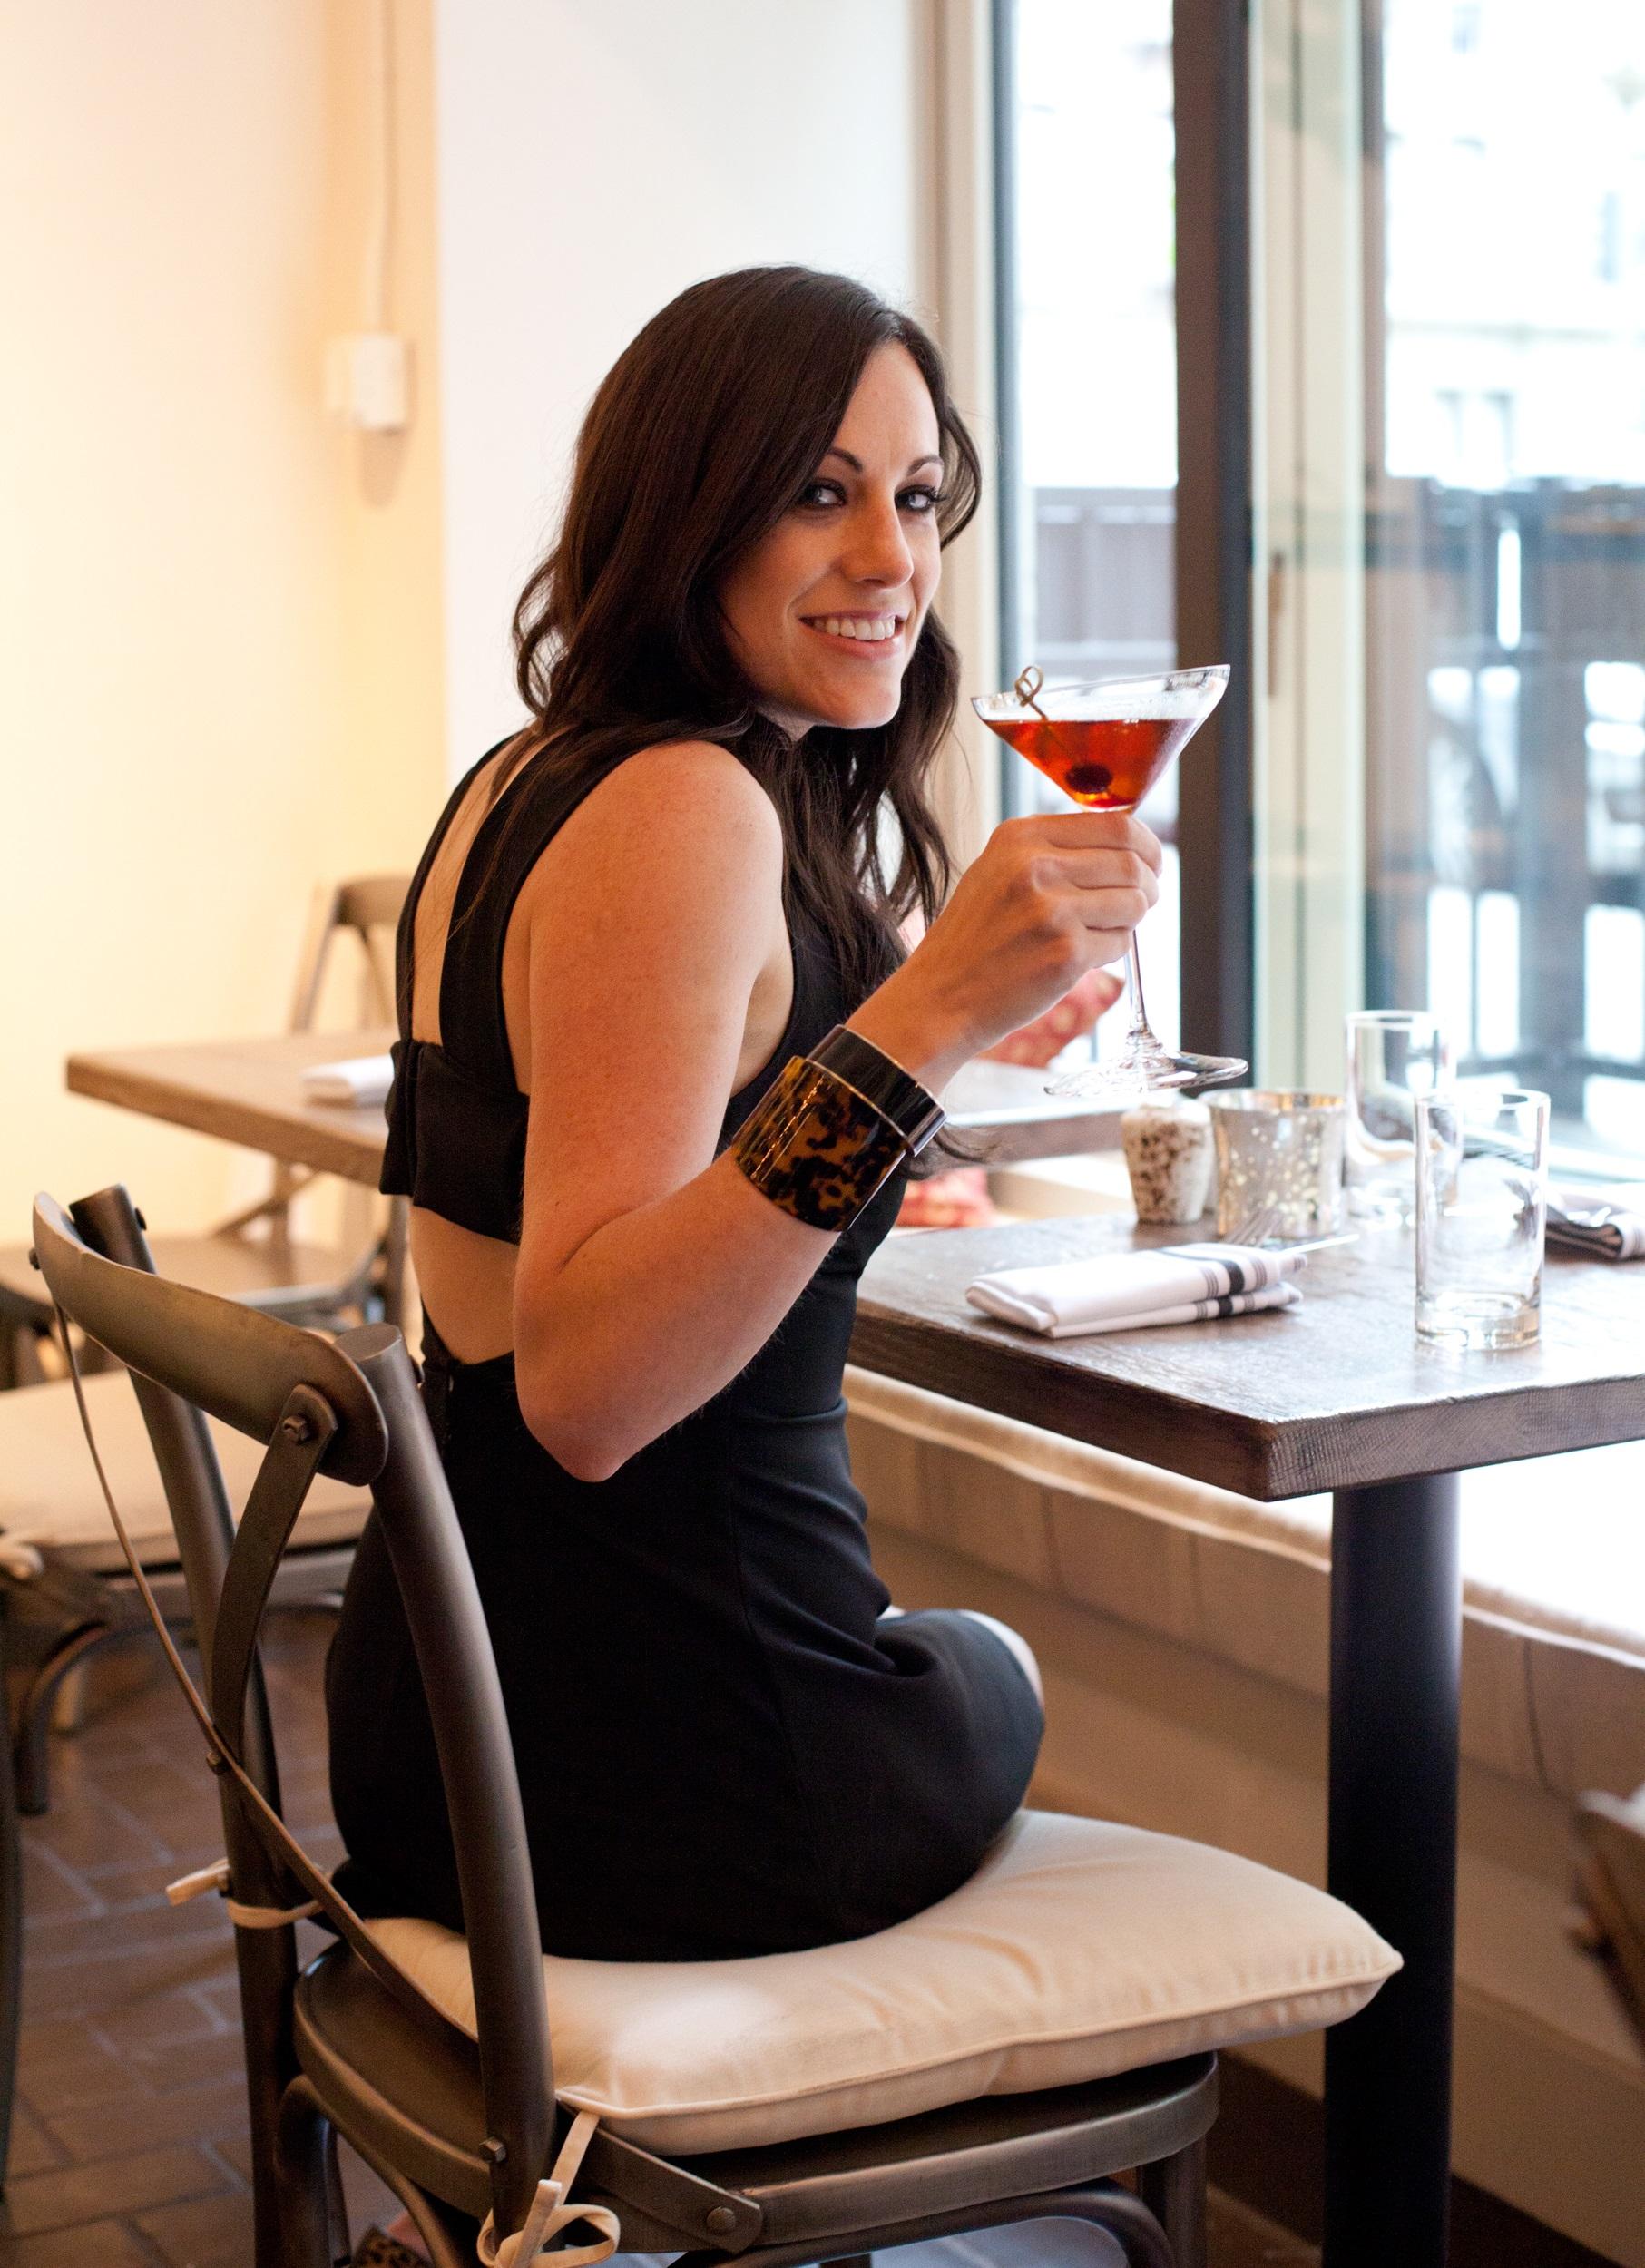 NatalieMigliarini, founder of Beautiful Booze